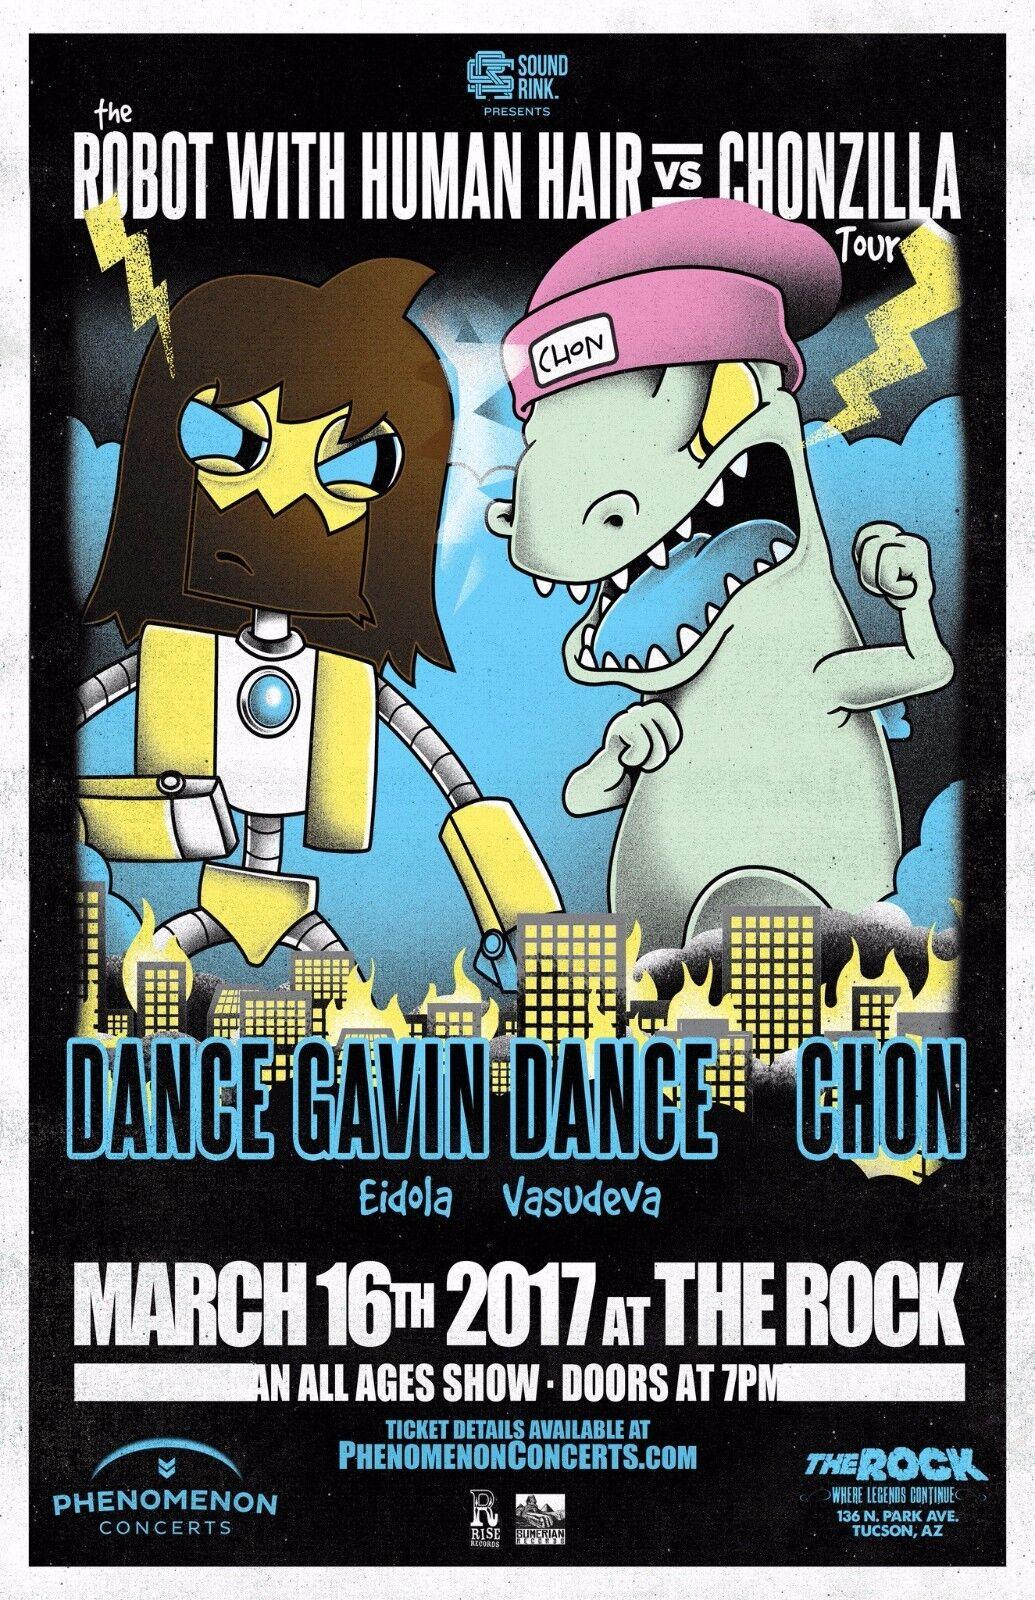 DANCE GAVIN DANCE / CHON ROBOT WITH HUMAN HAIR TOUR 2017 TUCSON CONCERT POSTER - $11.99